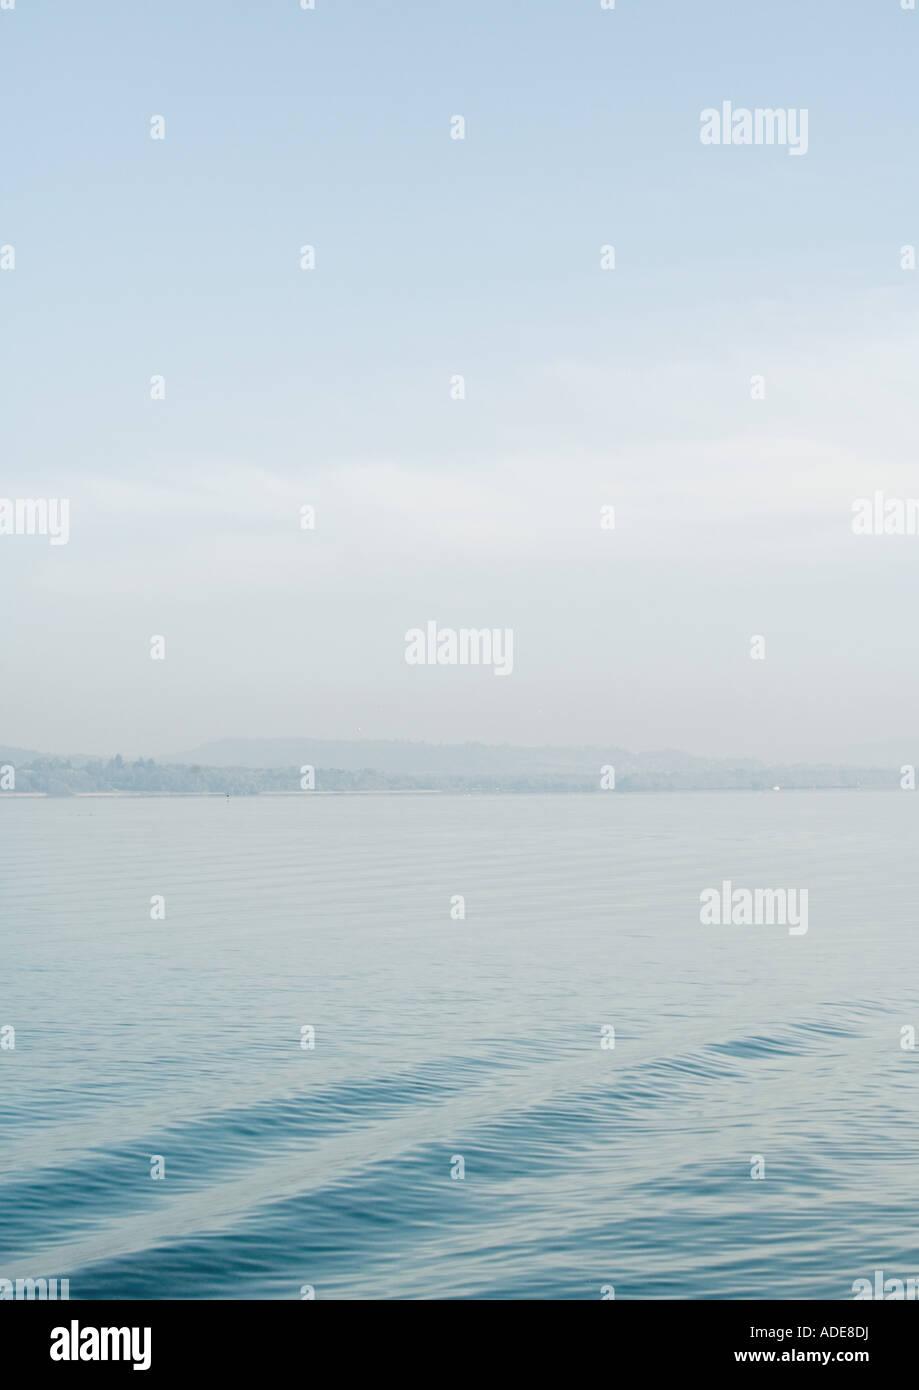 Lake, surface of water rippling - Stock Image